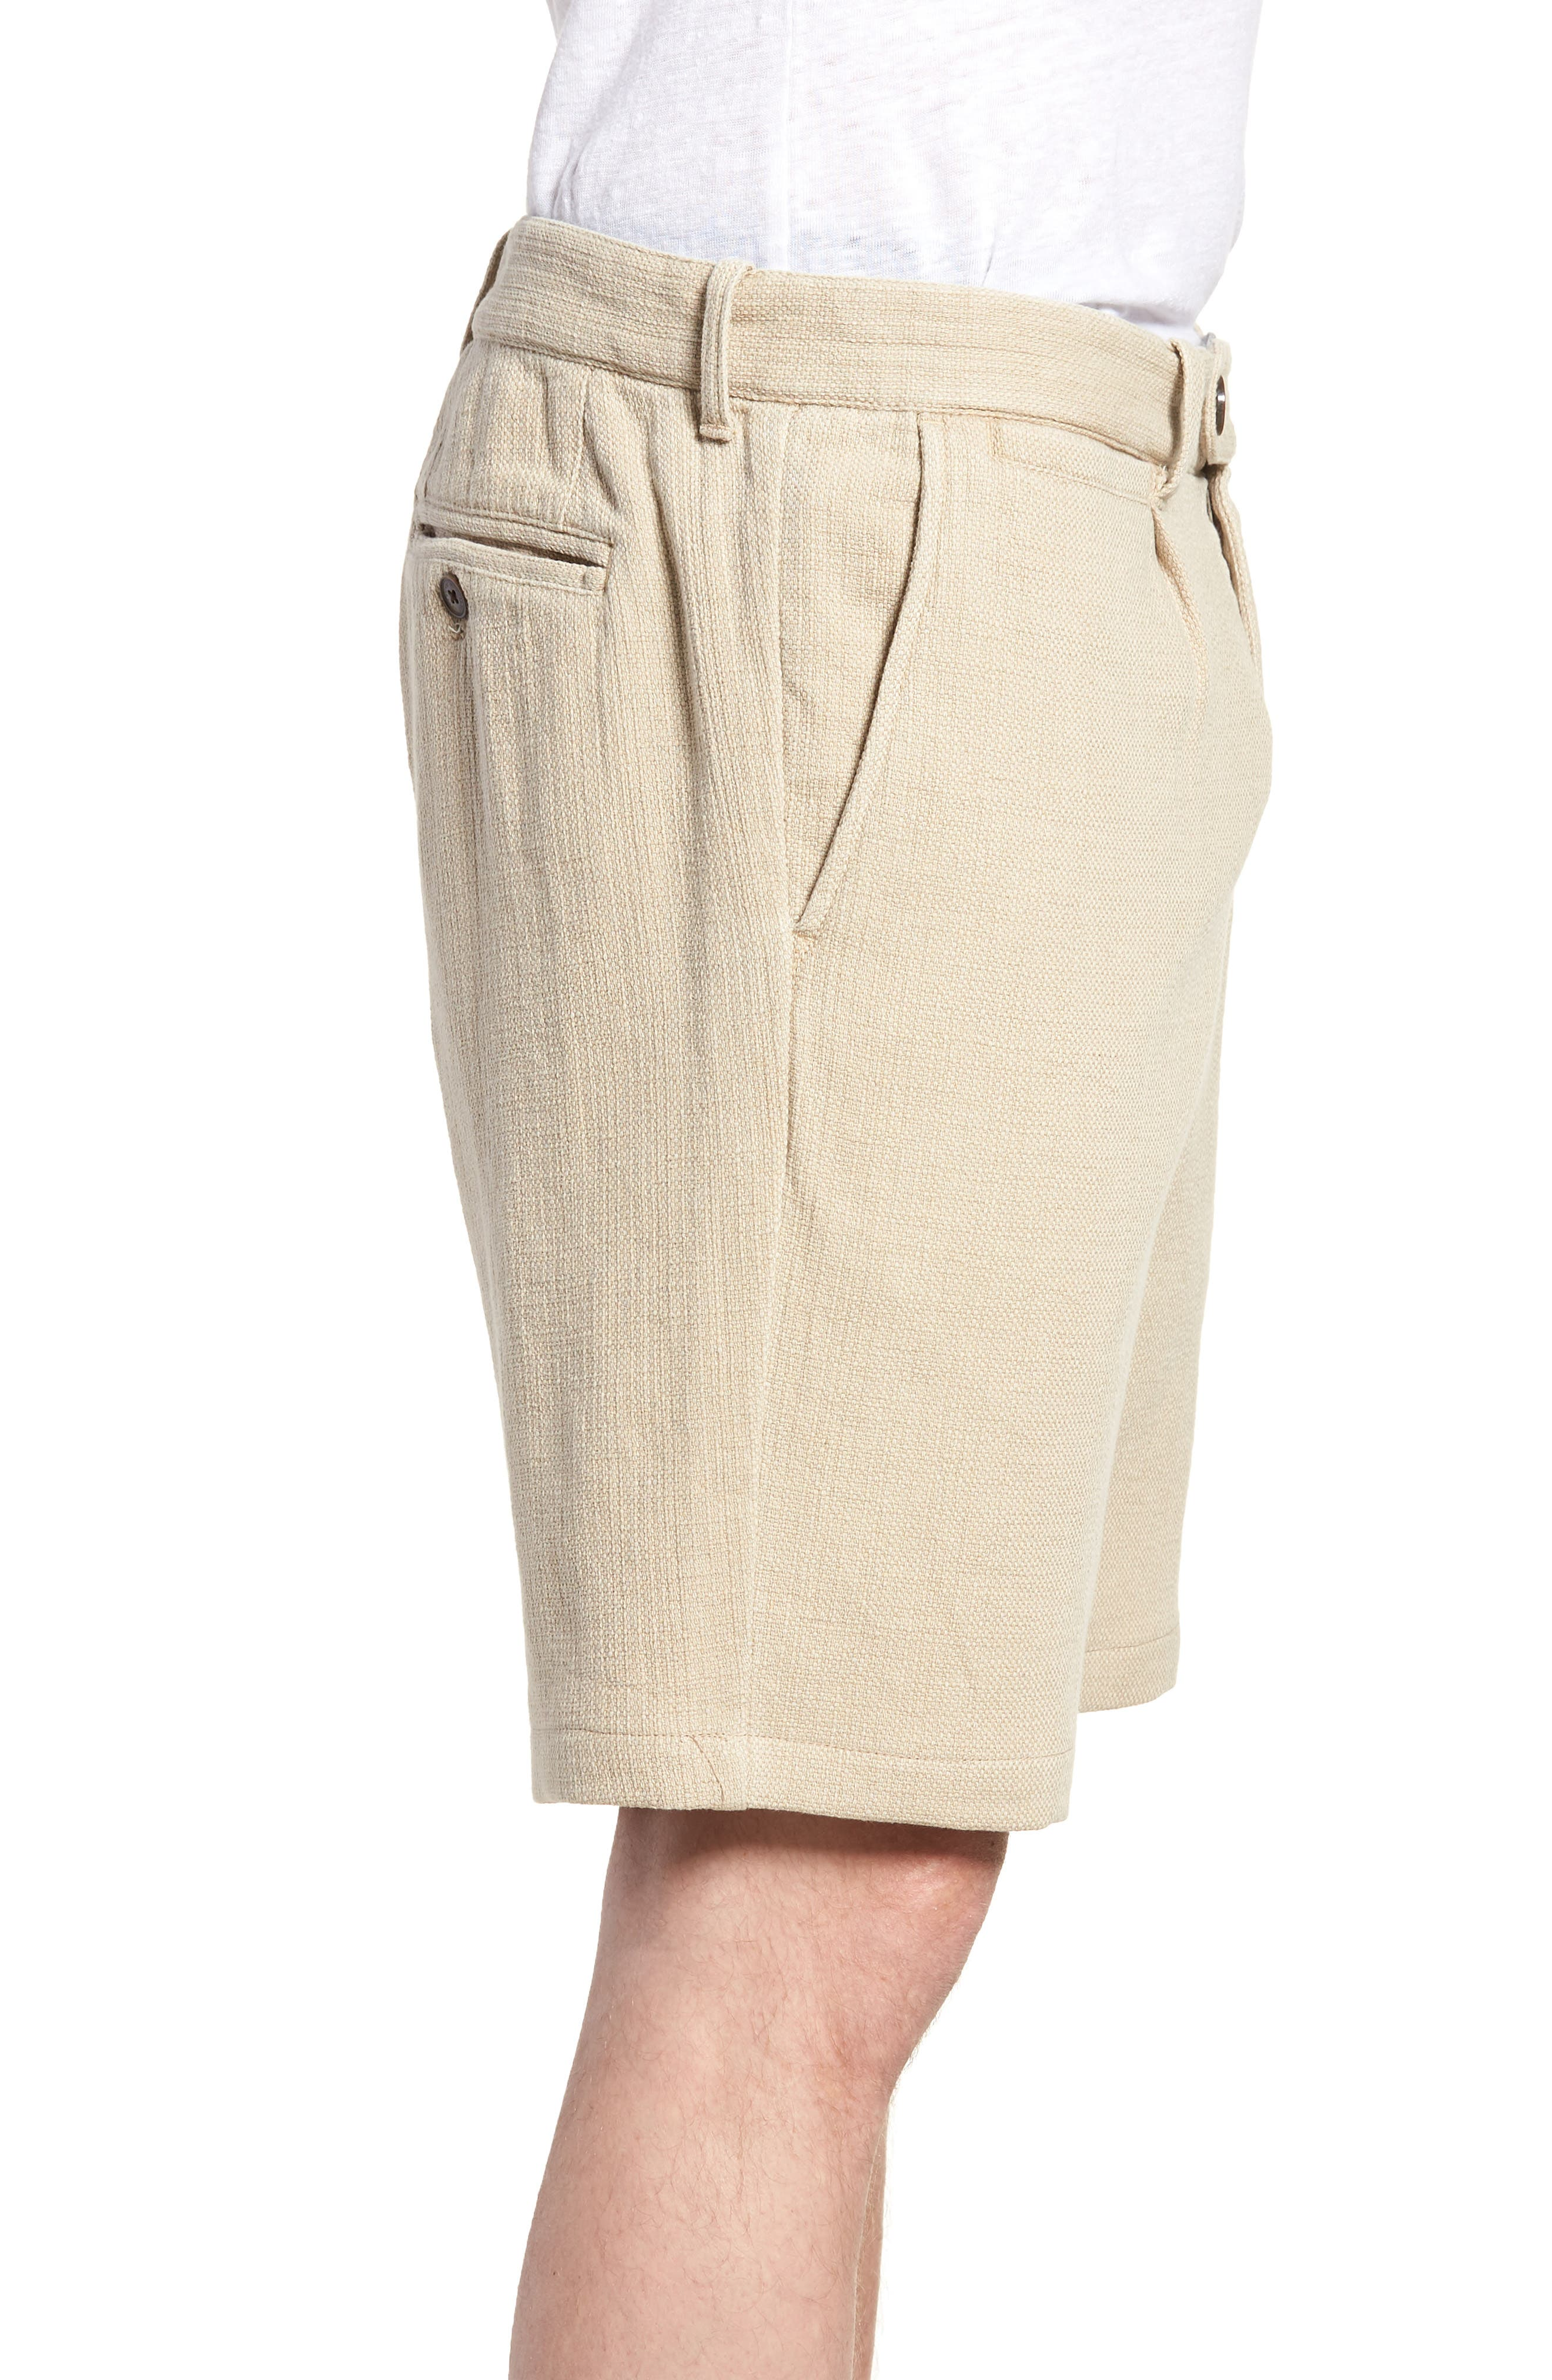 Thomas Regular Fit Pleated Shorts,                             Alternate thumbnail 3, color,                             250